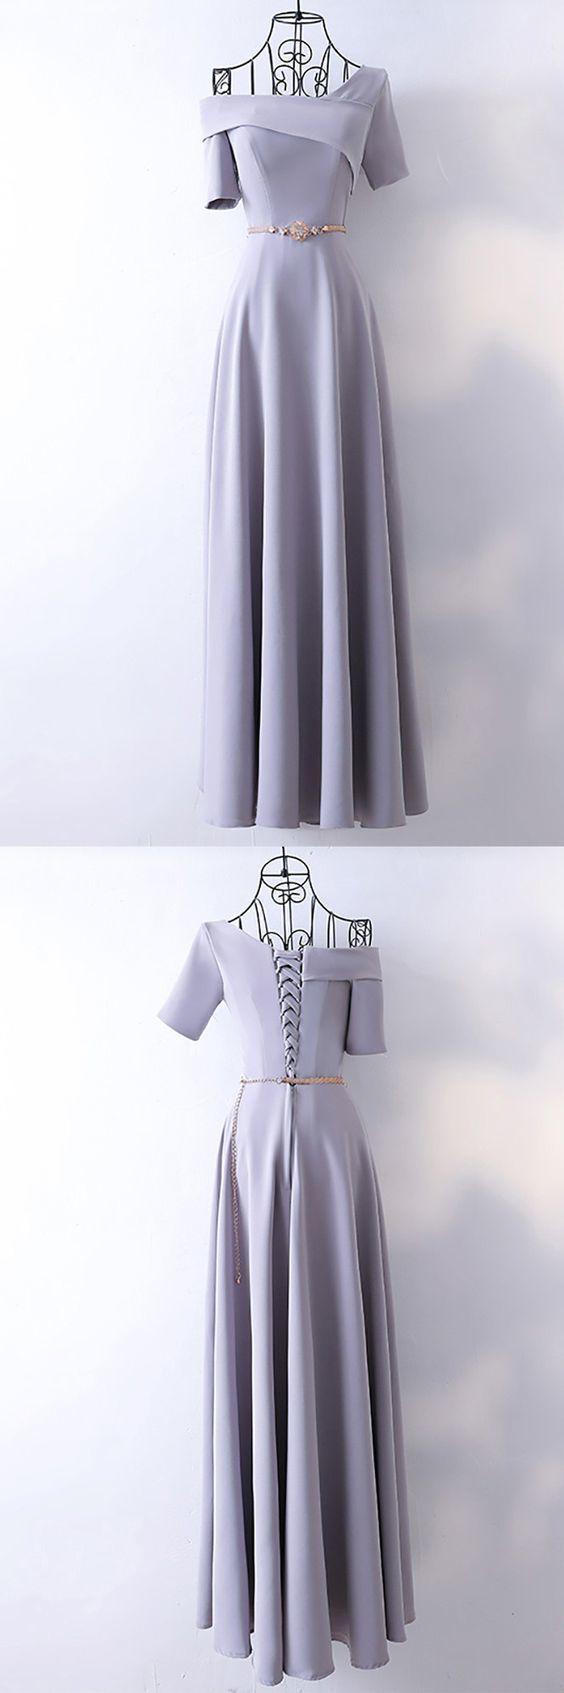 classy long grey formal evening dress with asymmetrical